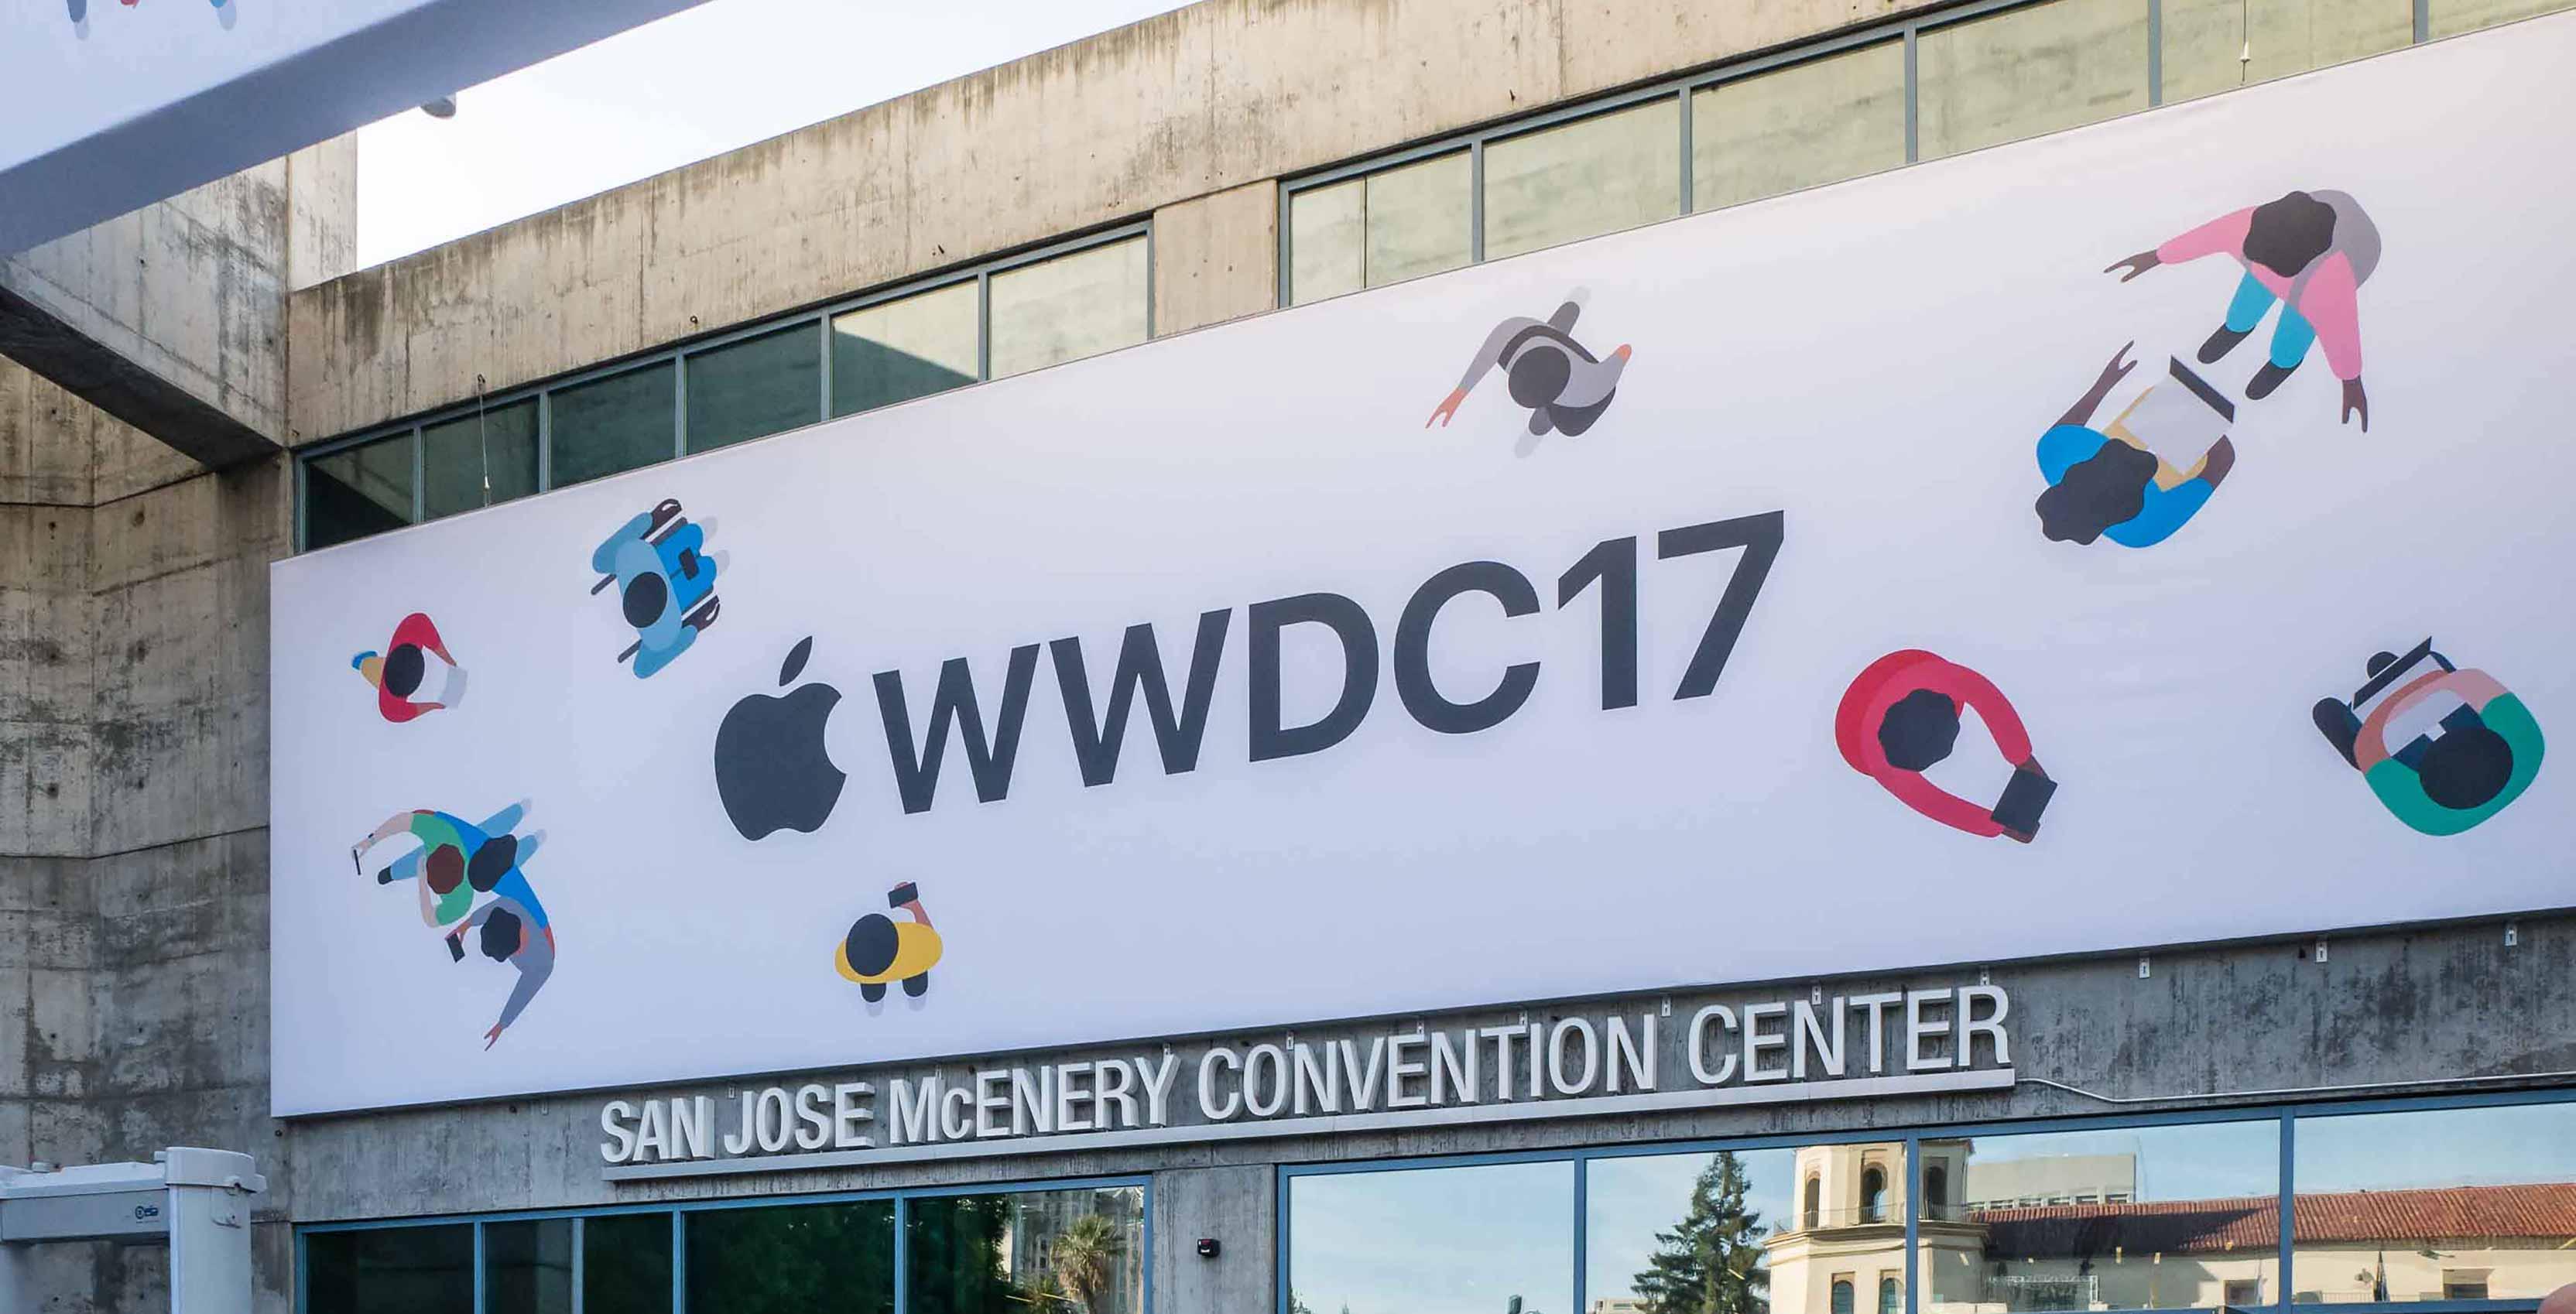 WWDC 2017 event